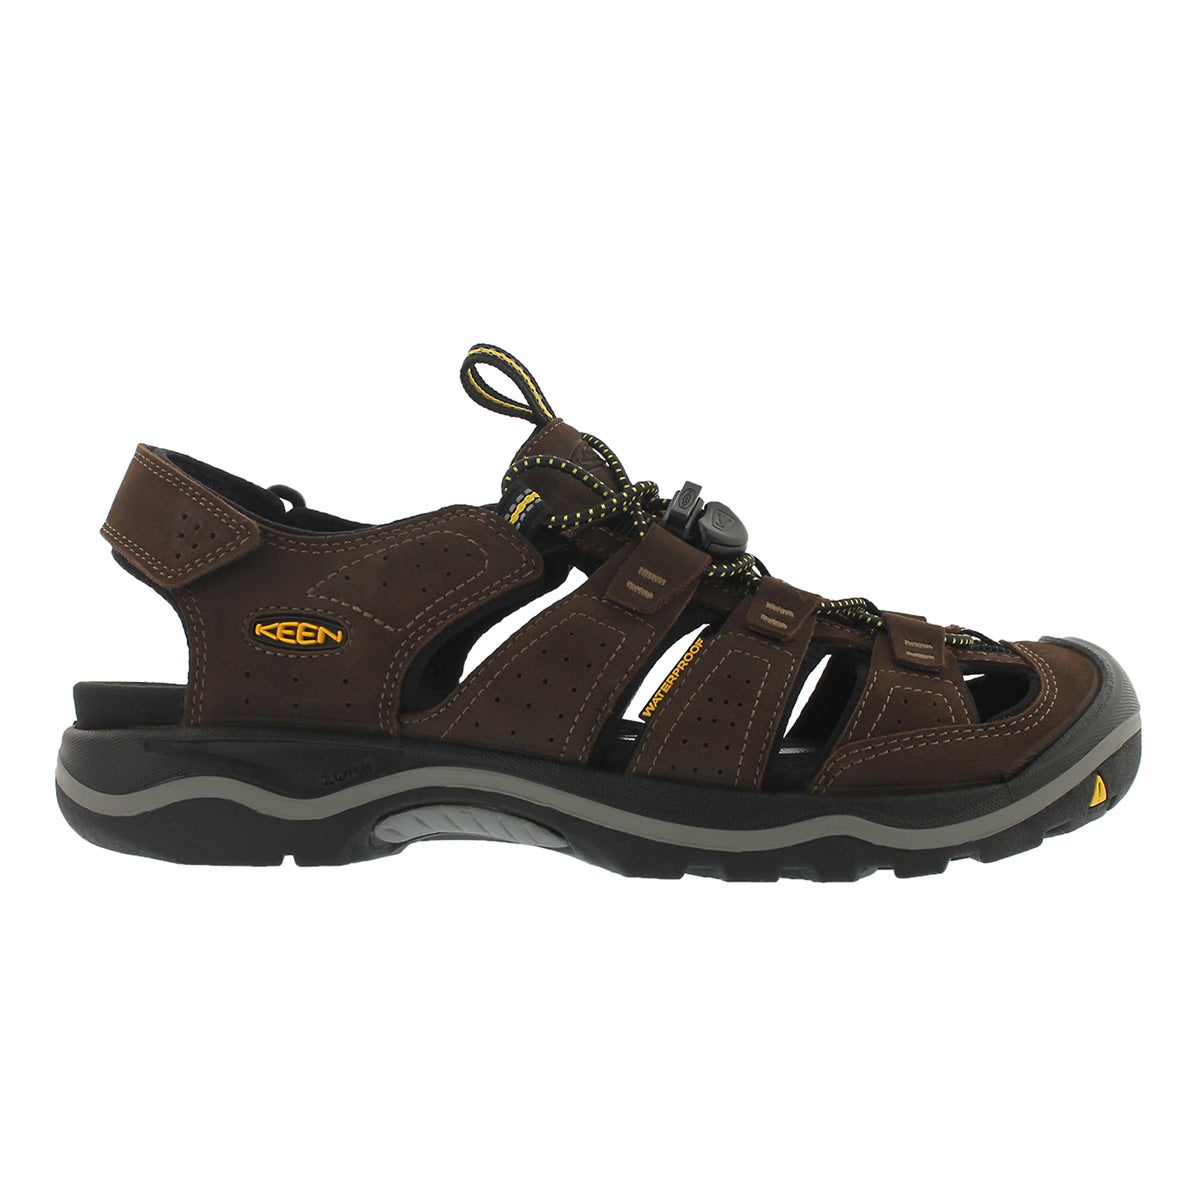 Mns Rialto bison leather sport sandal